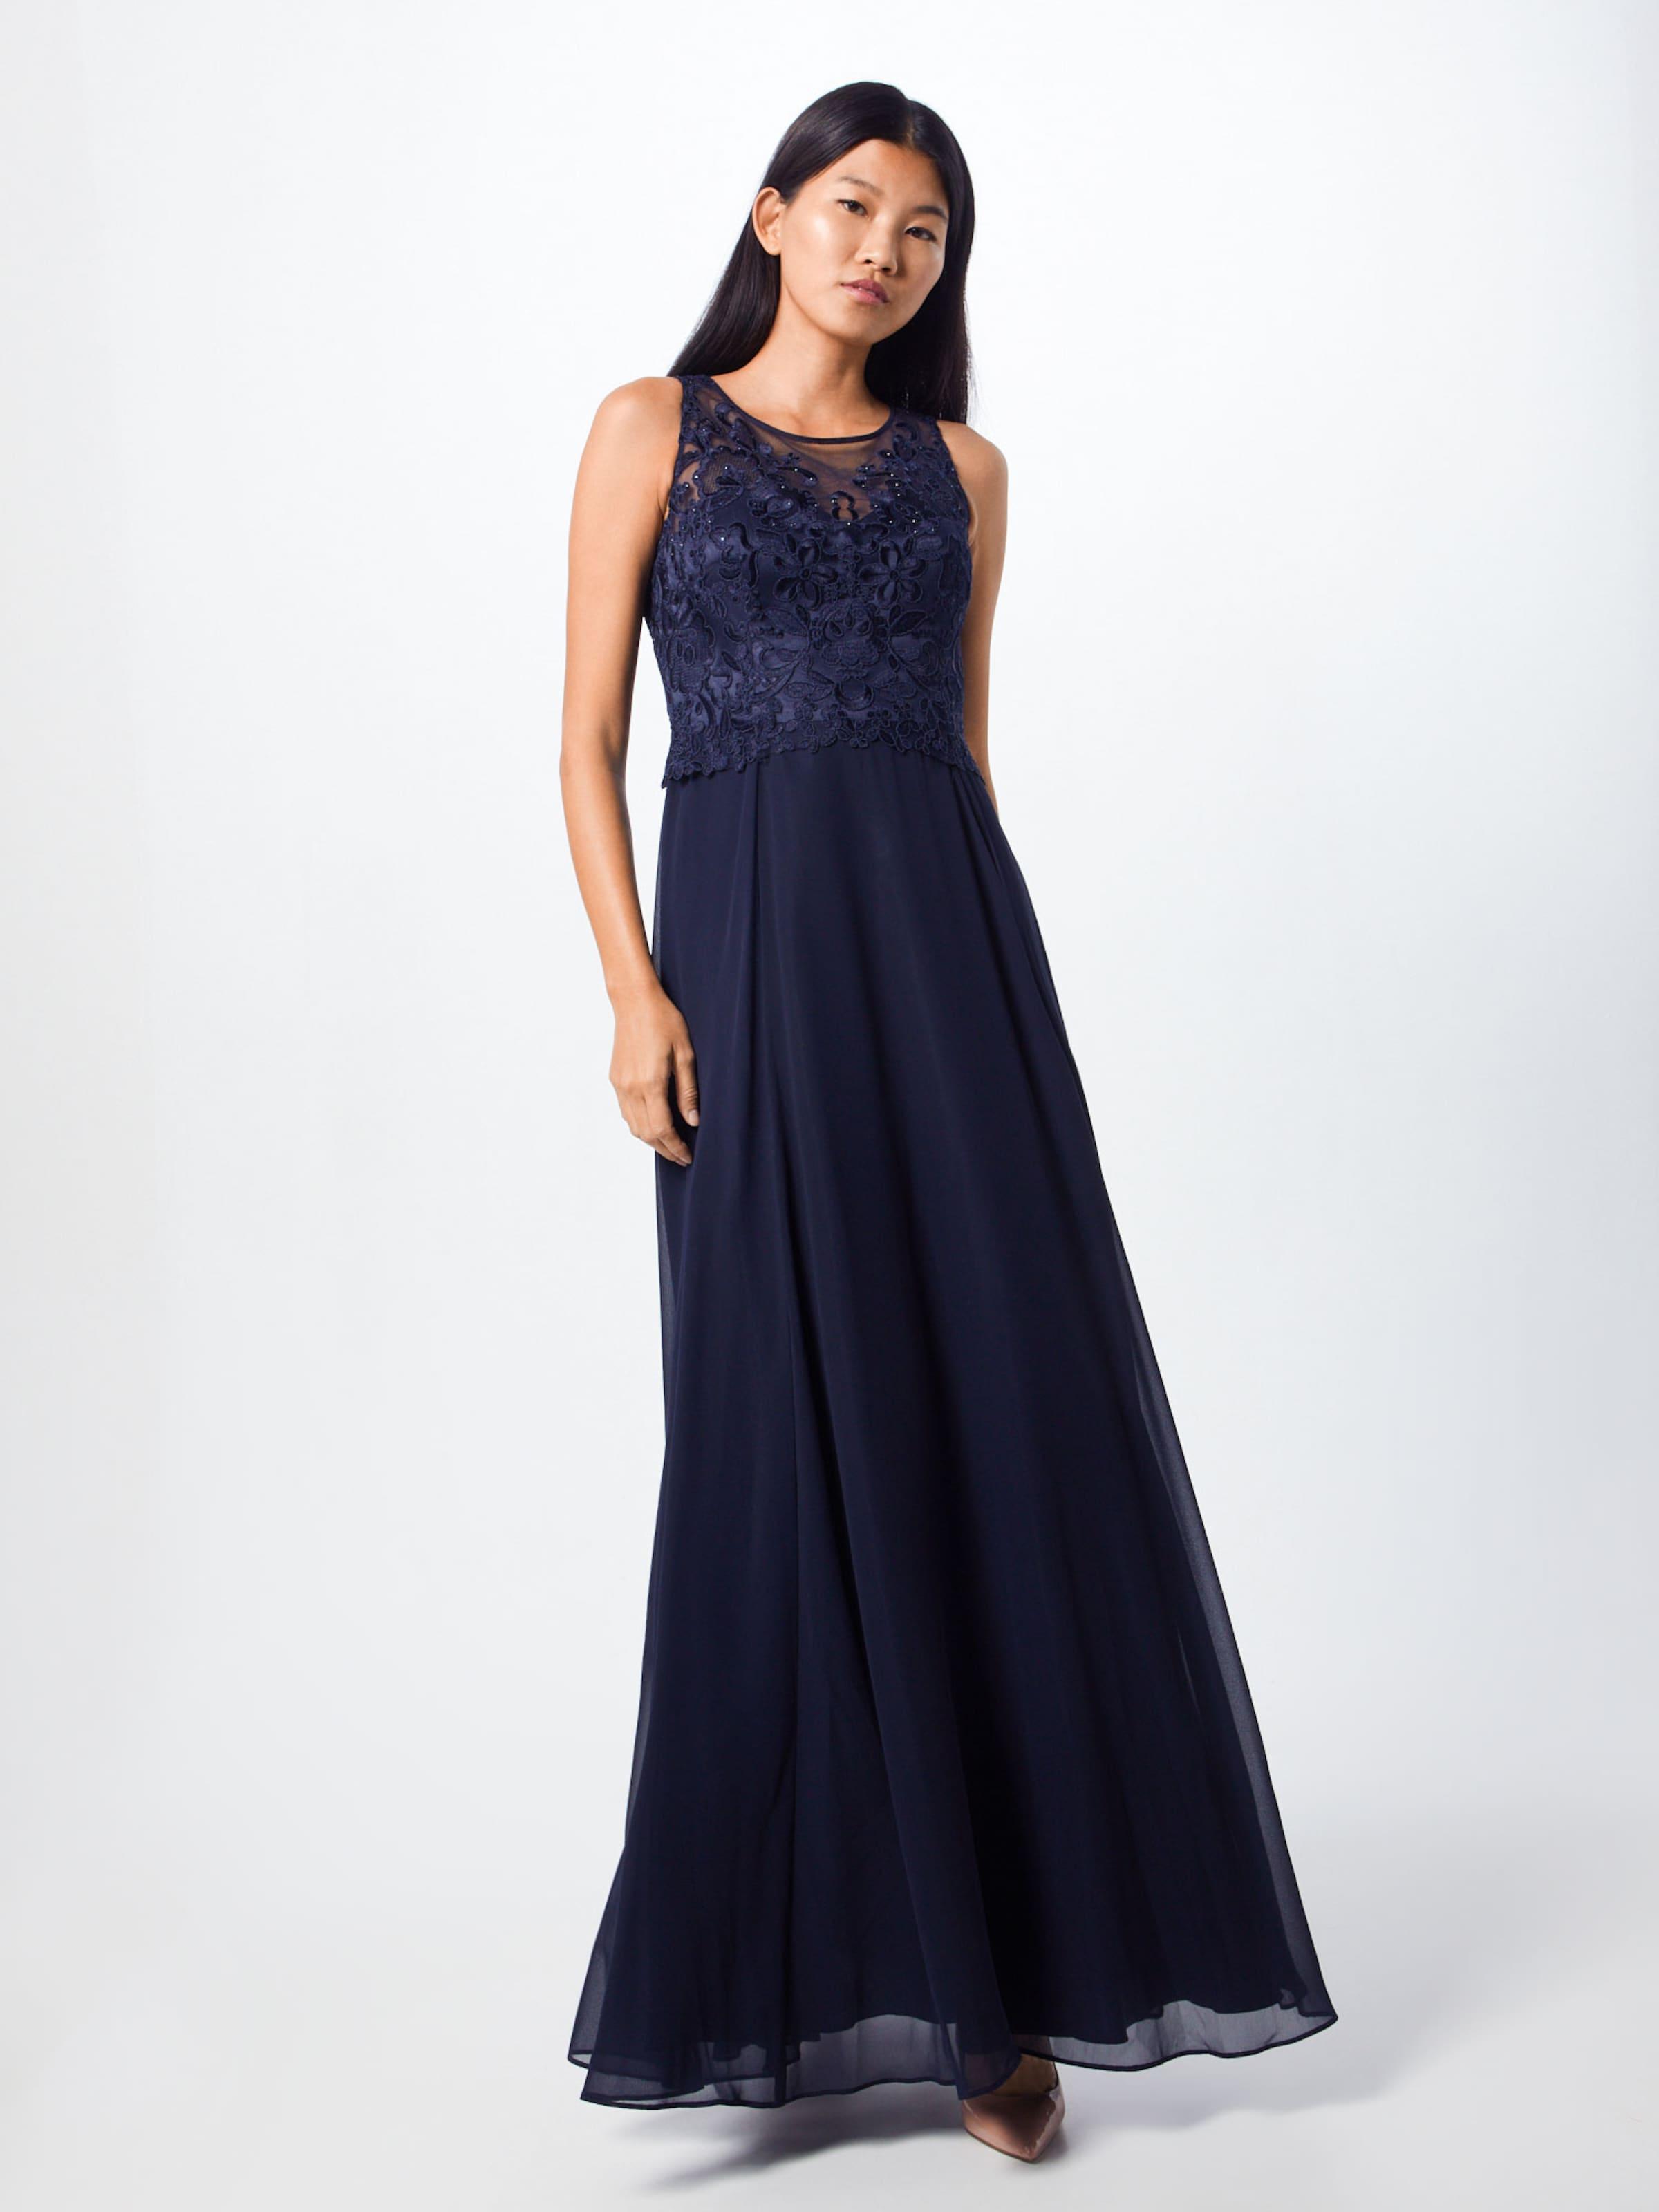 Vera Mont En De Soirée Bleu Robe Foncé OPnw0k